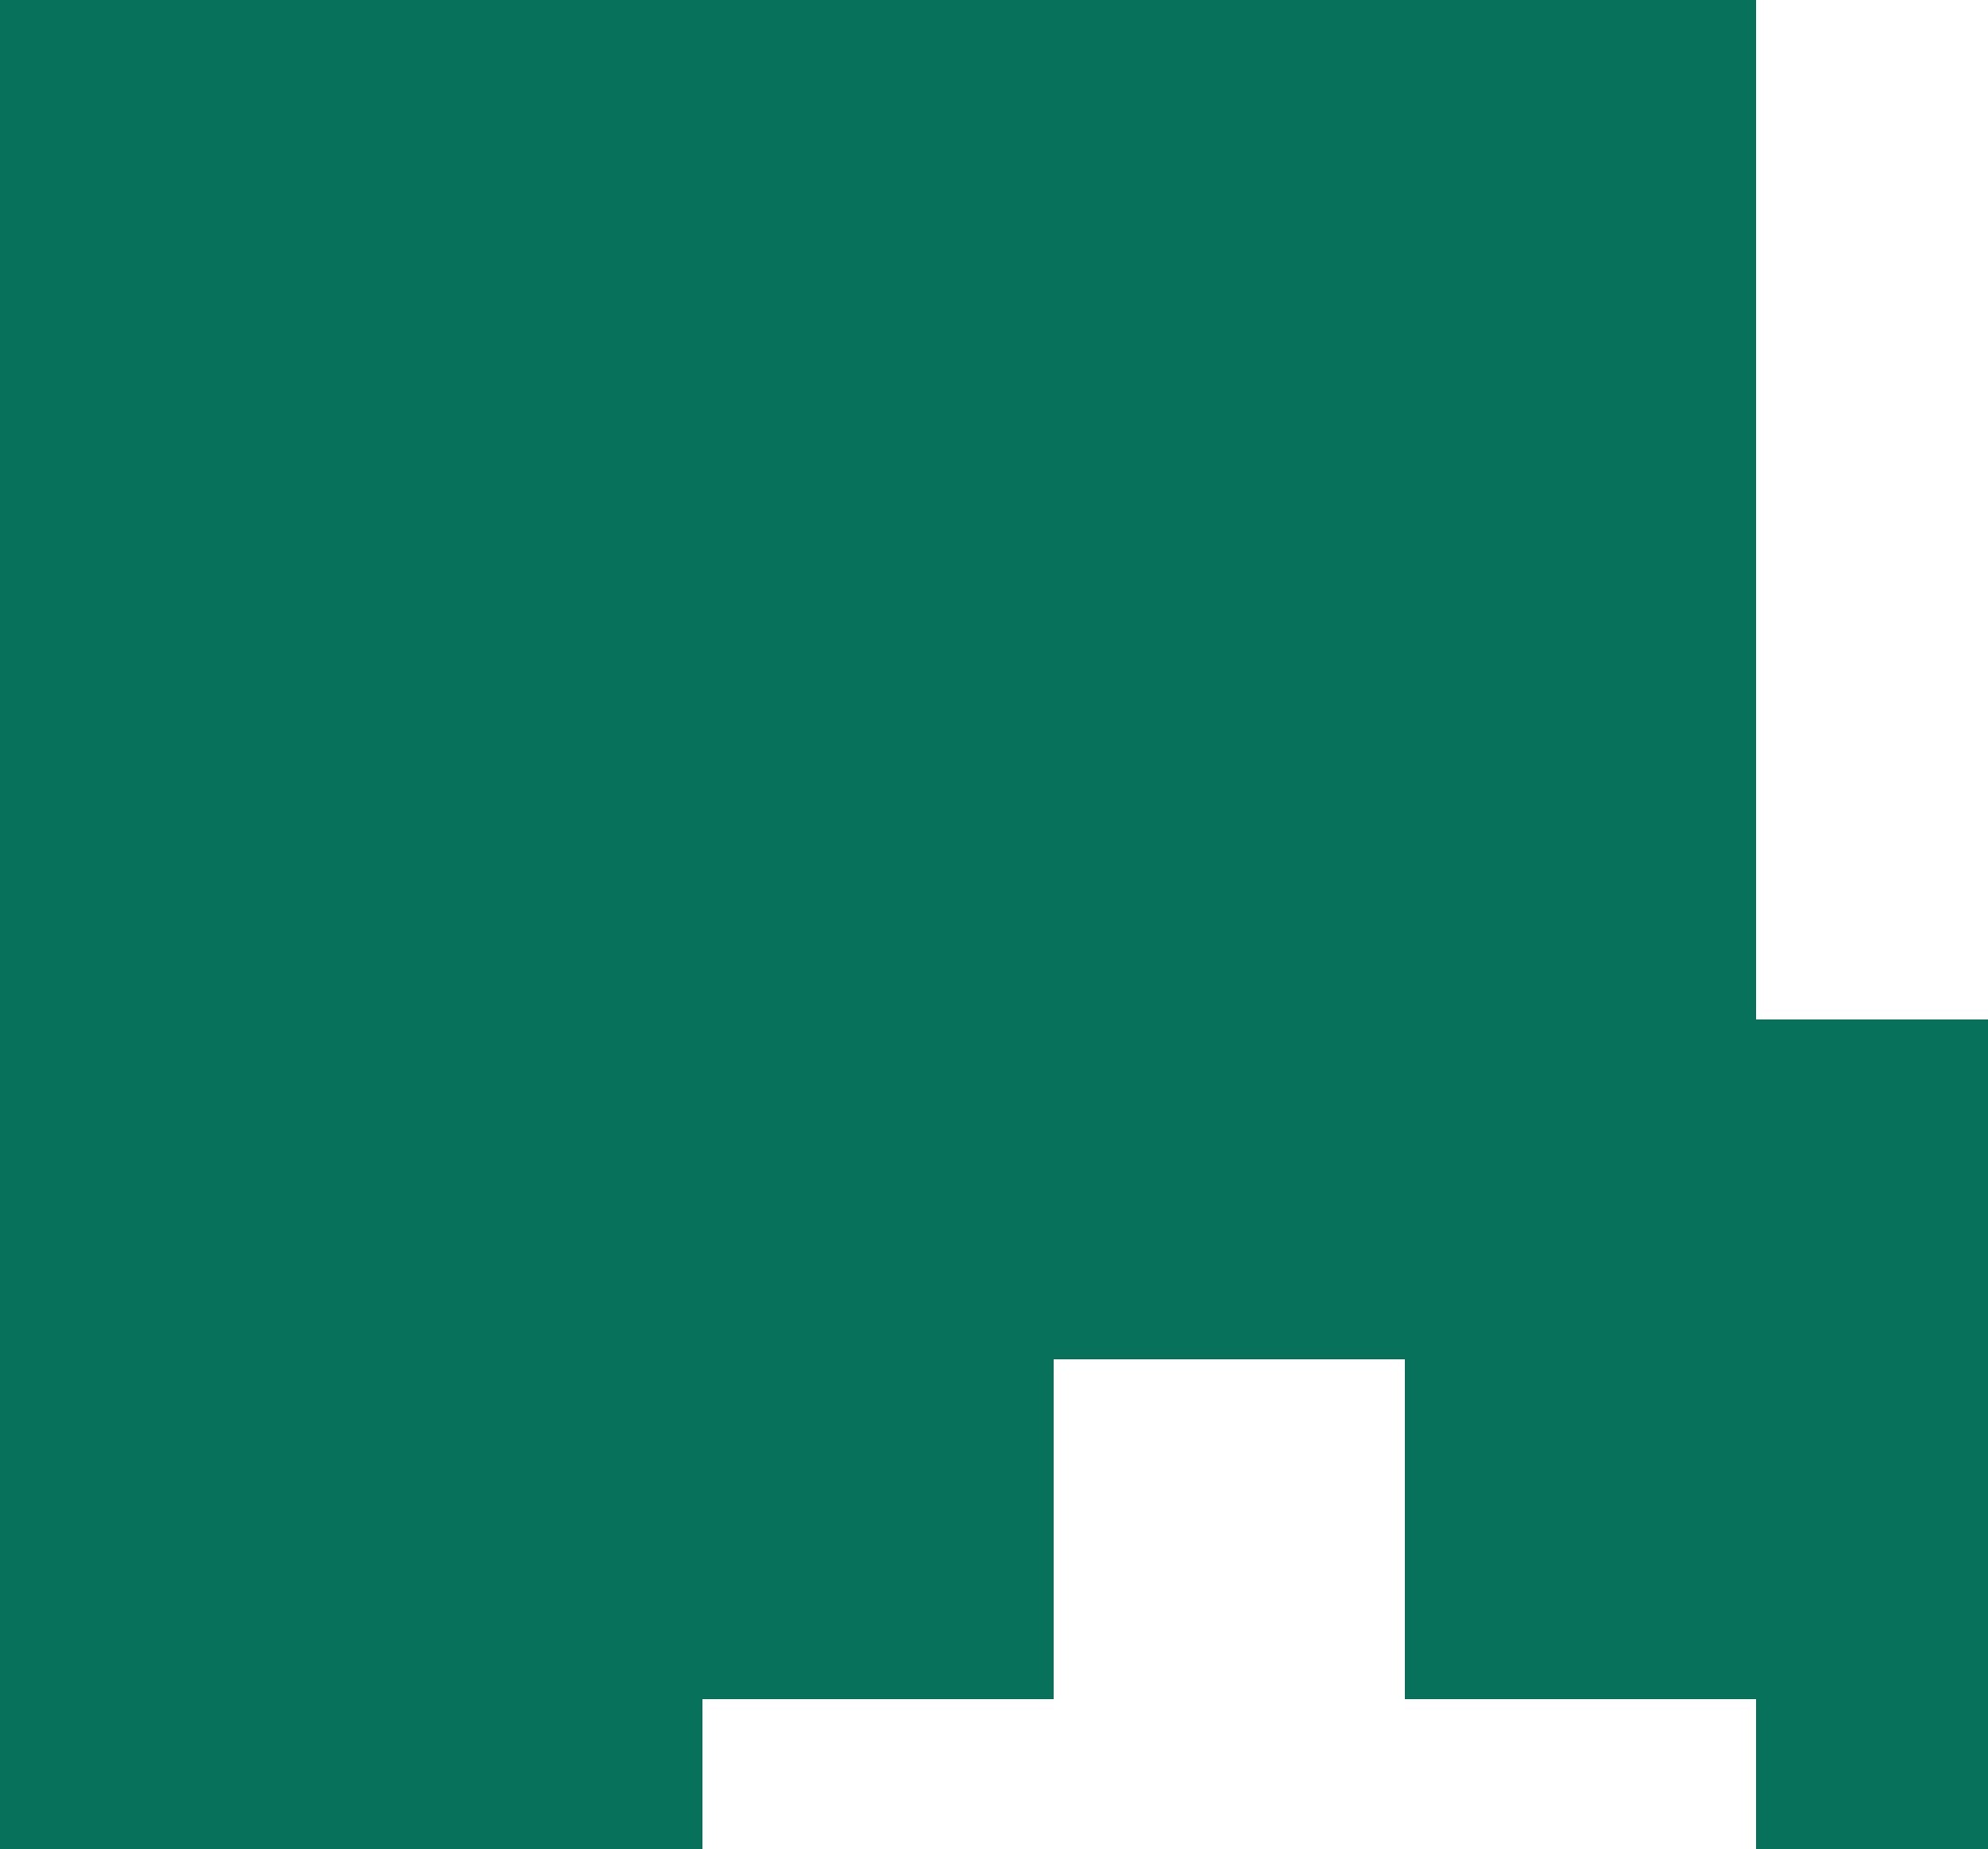 Pine green Alaska state icon